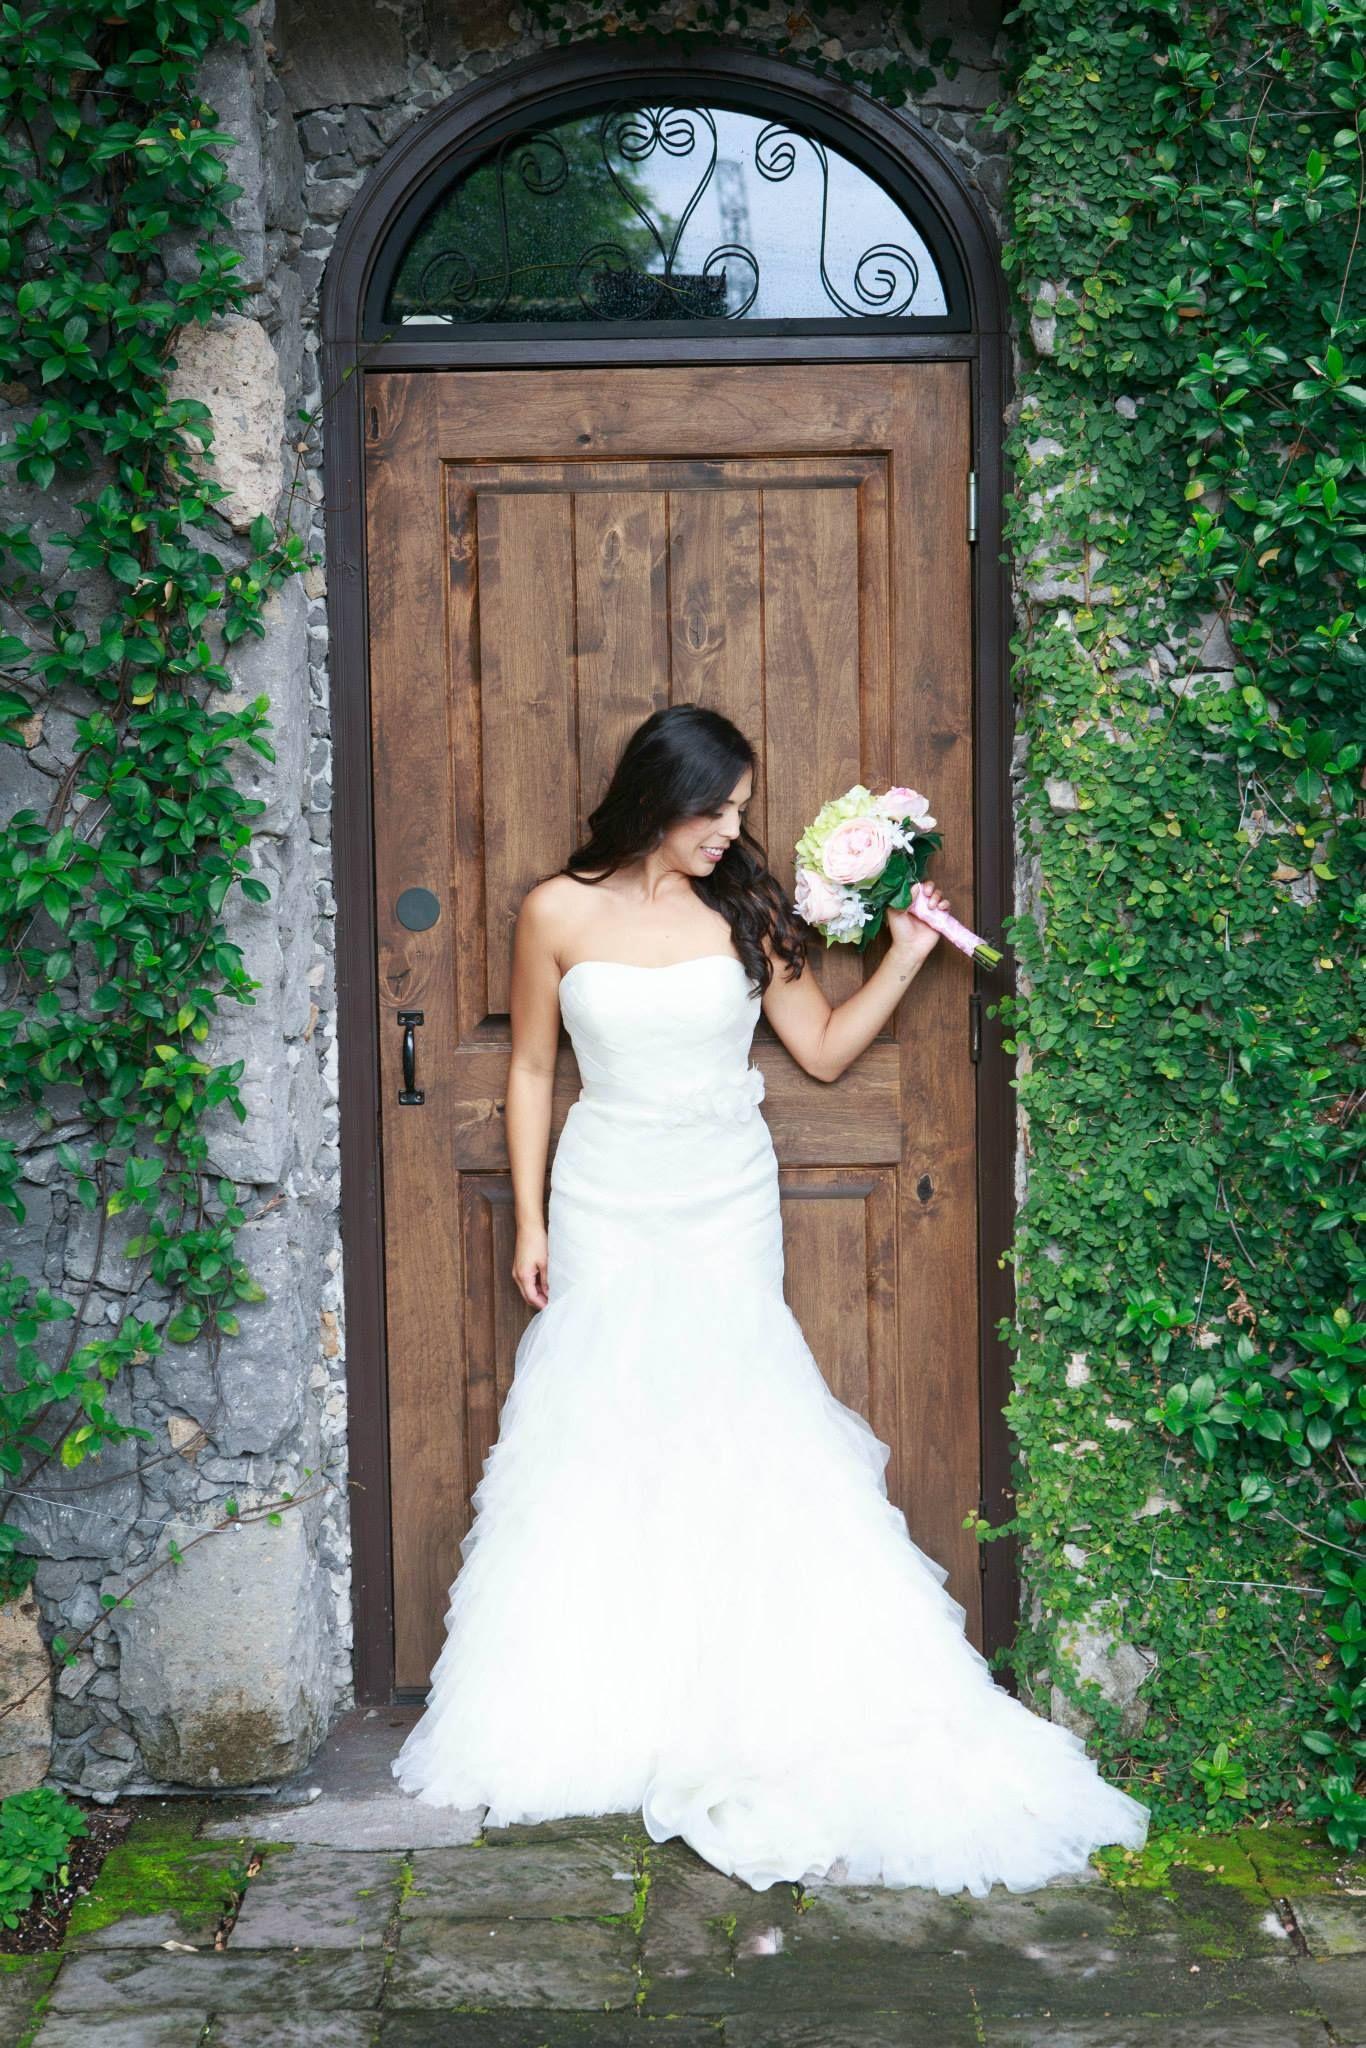 Houston Wedding Photographer    Bobby Diba Photography    www.bobbydiba.com